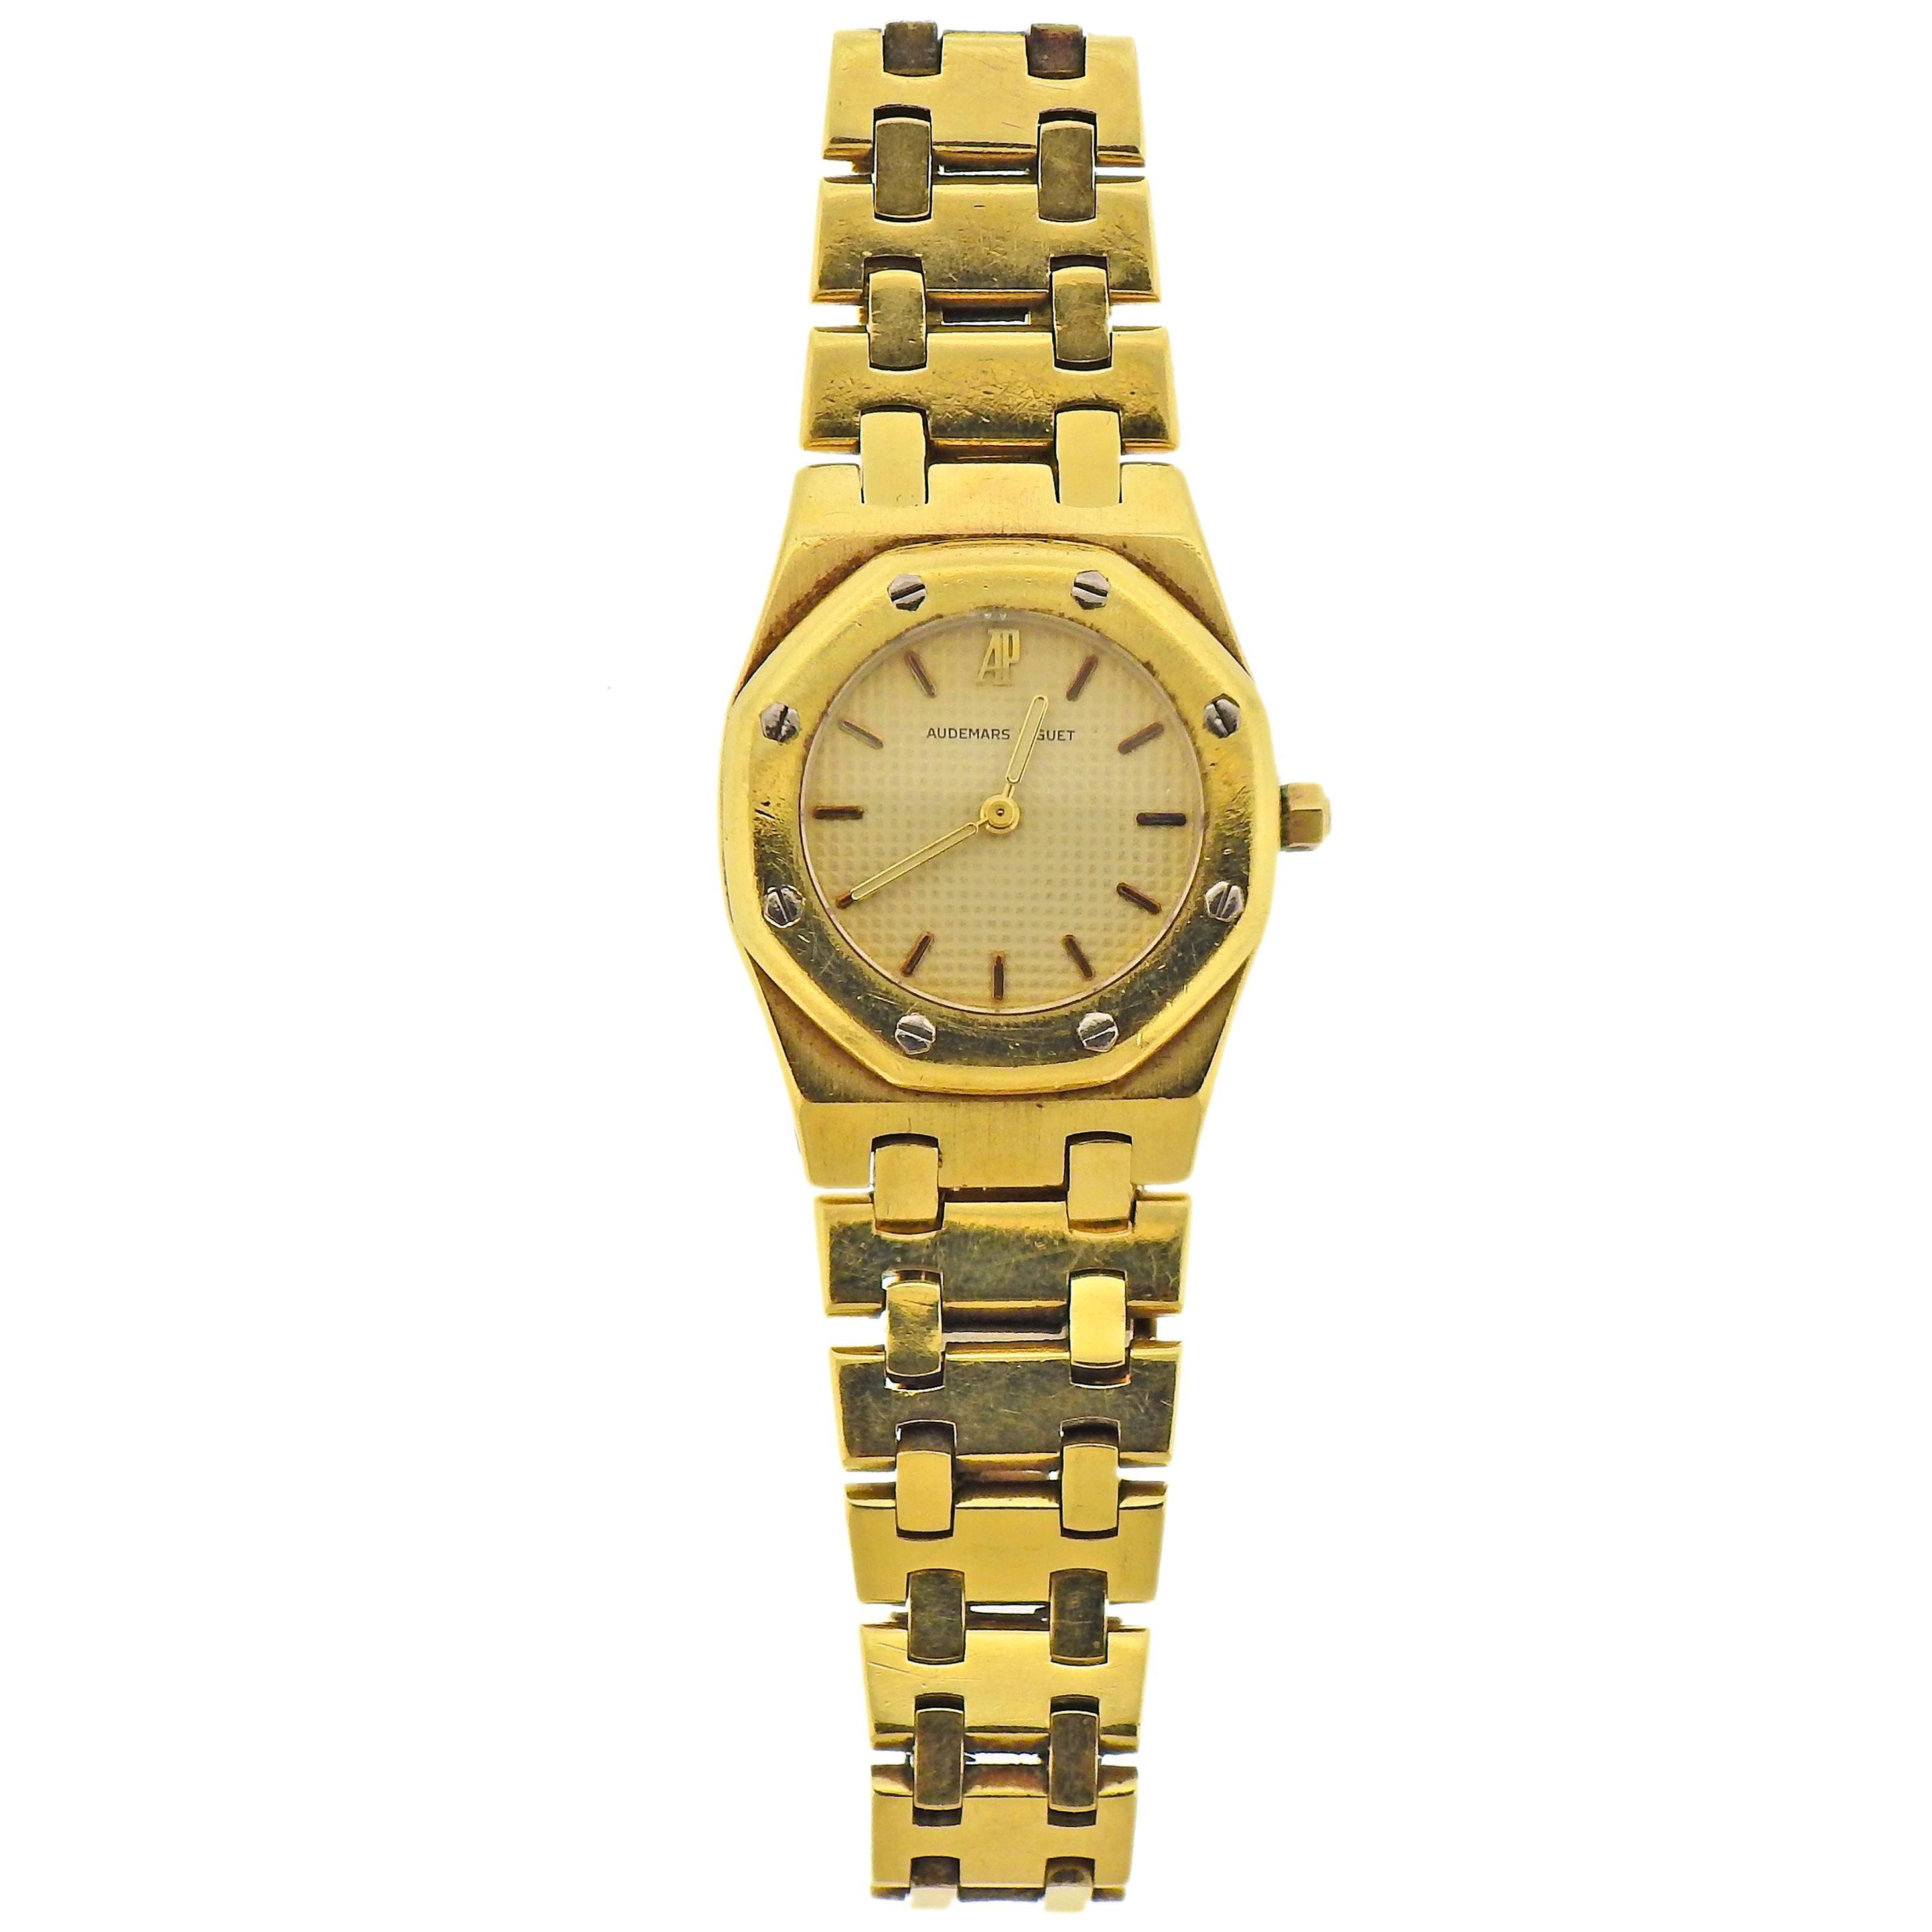 Audemars Piguet Royal Oak Gold Ladies Watch